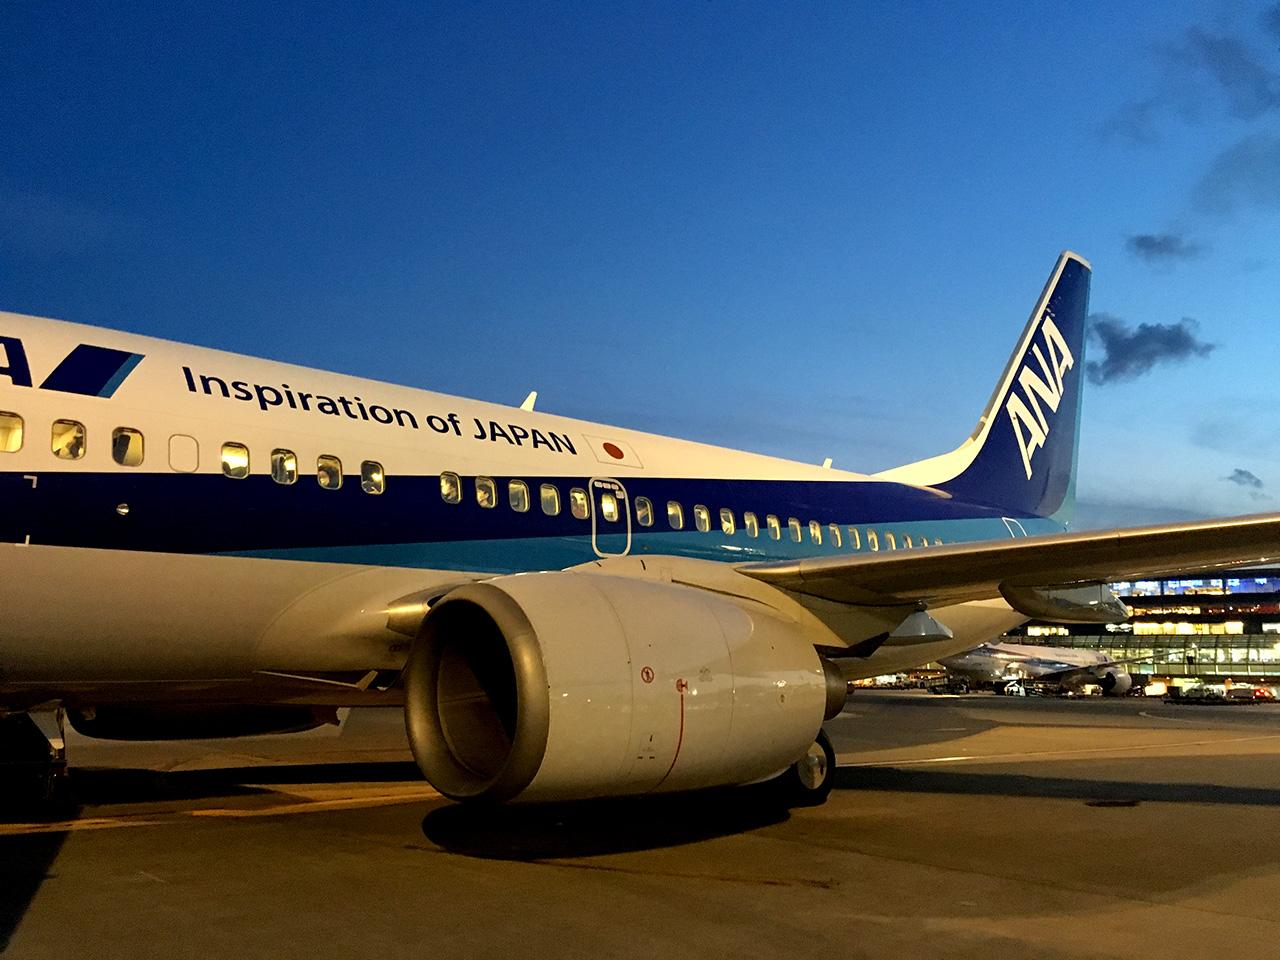 羽田空港,滑走路,誘導路,沖止め,737